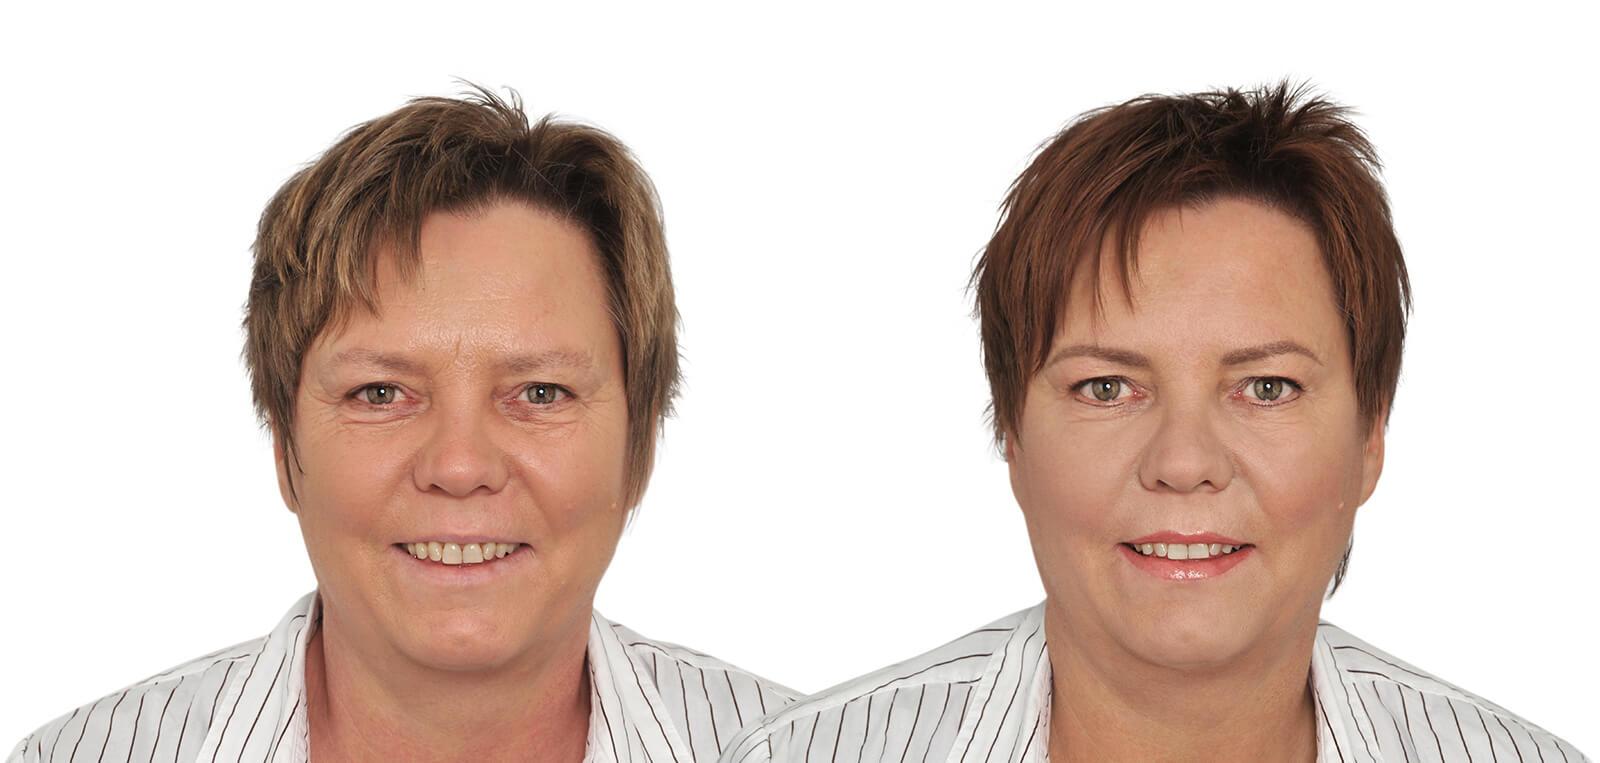 Permanent Make-Up vorher/nachher komplett Damen 03 | Der Jungbrunnen Aichach